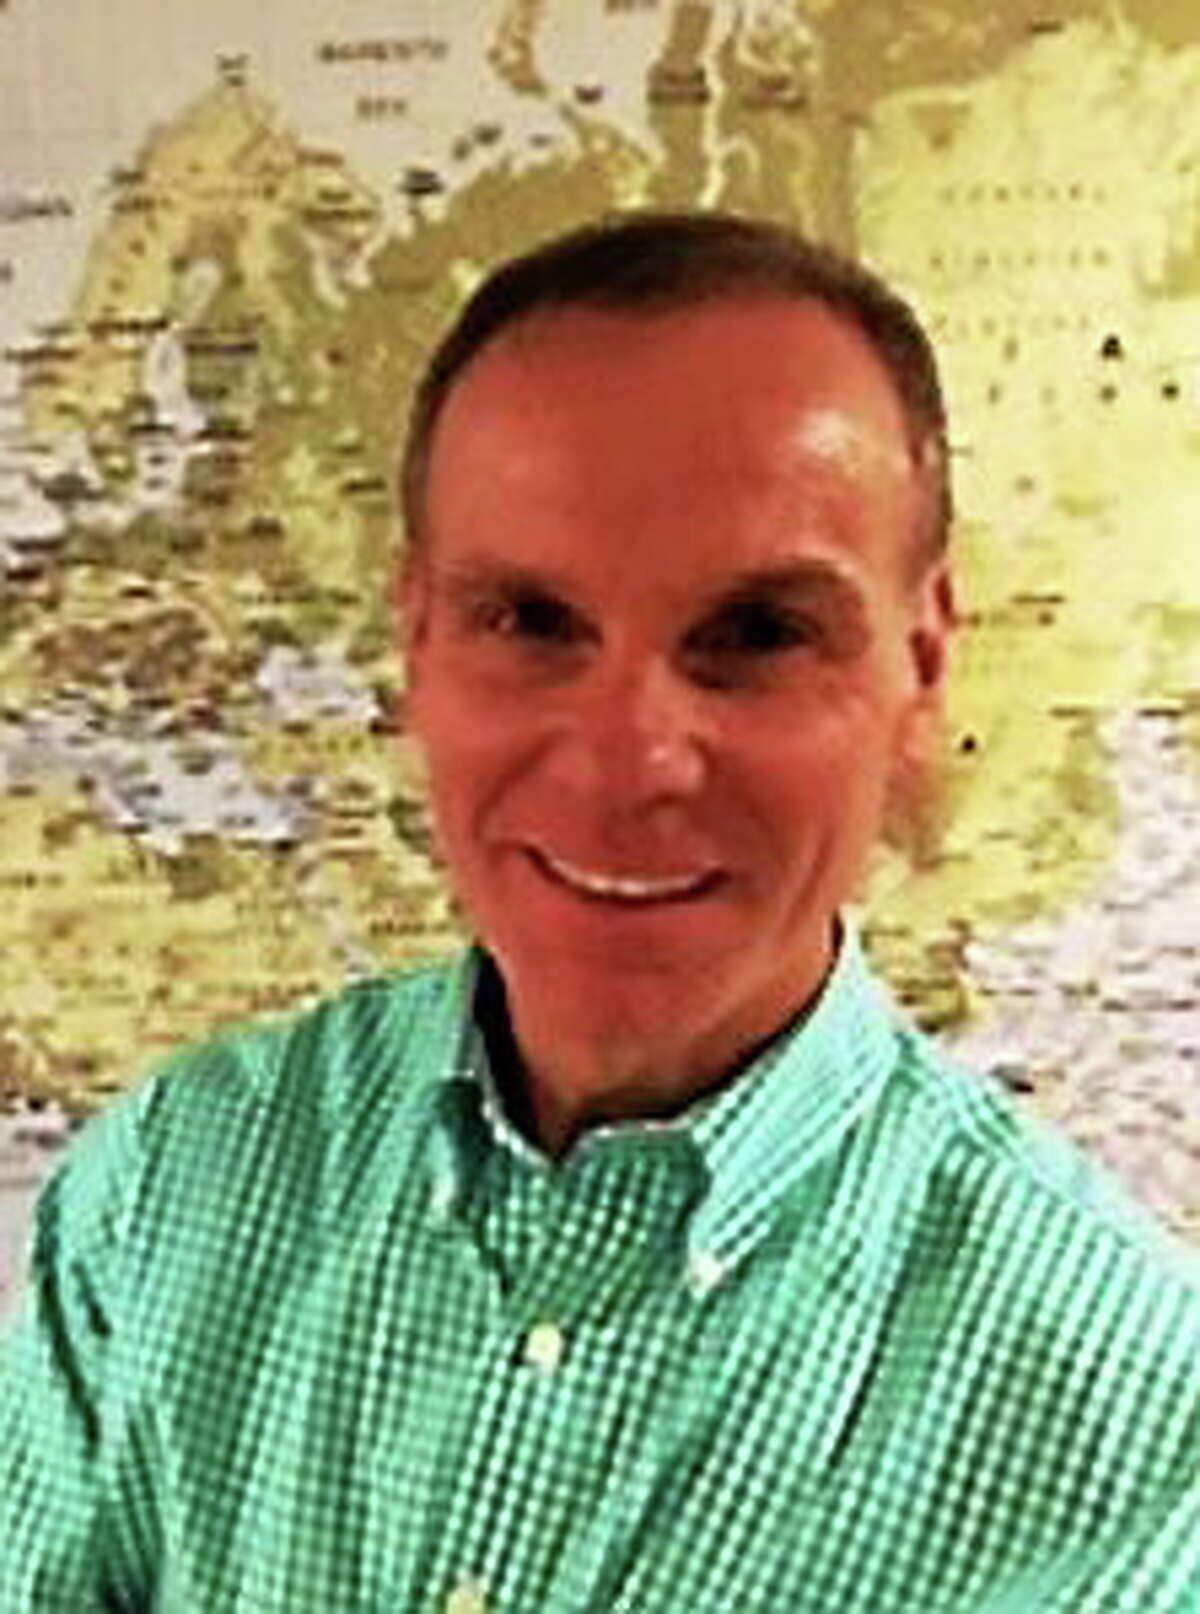 Lewis Nescott Jr. (Contributed photo)